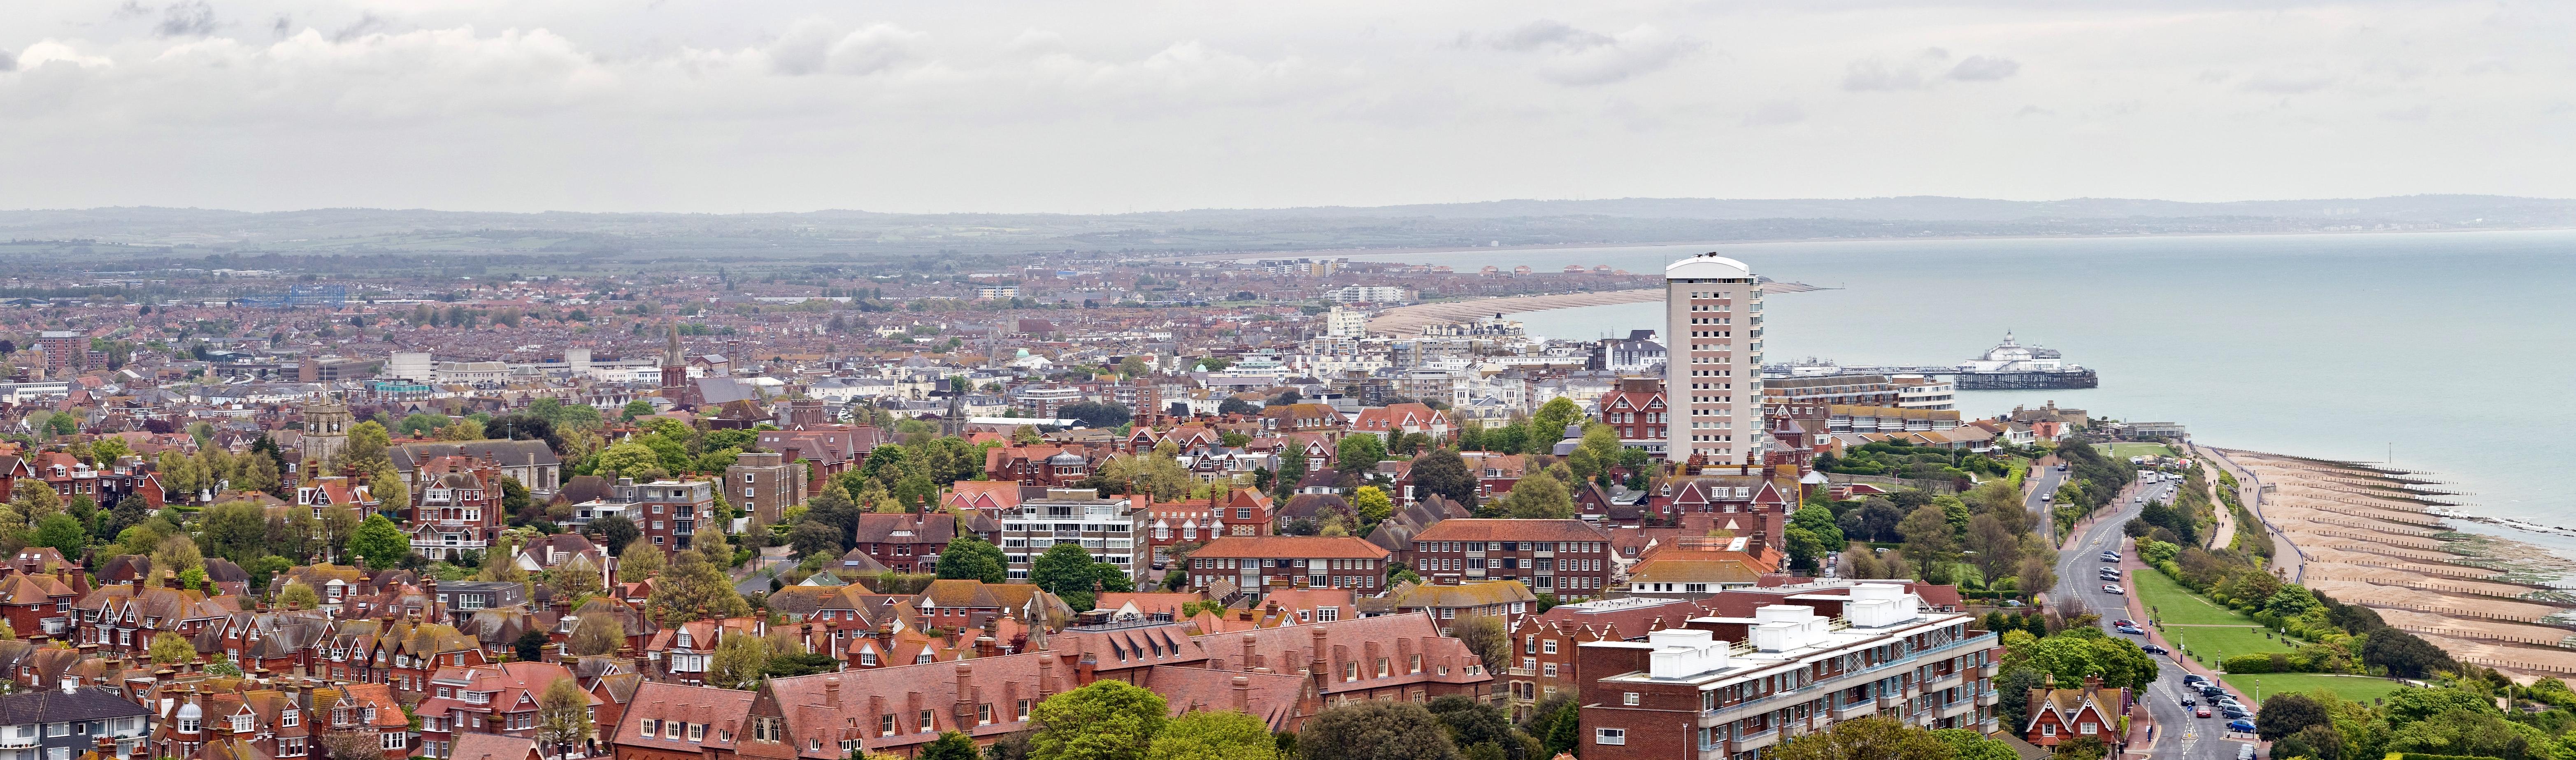 england panorama lake - photo #43